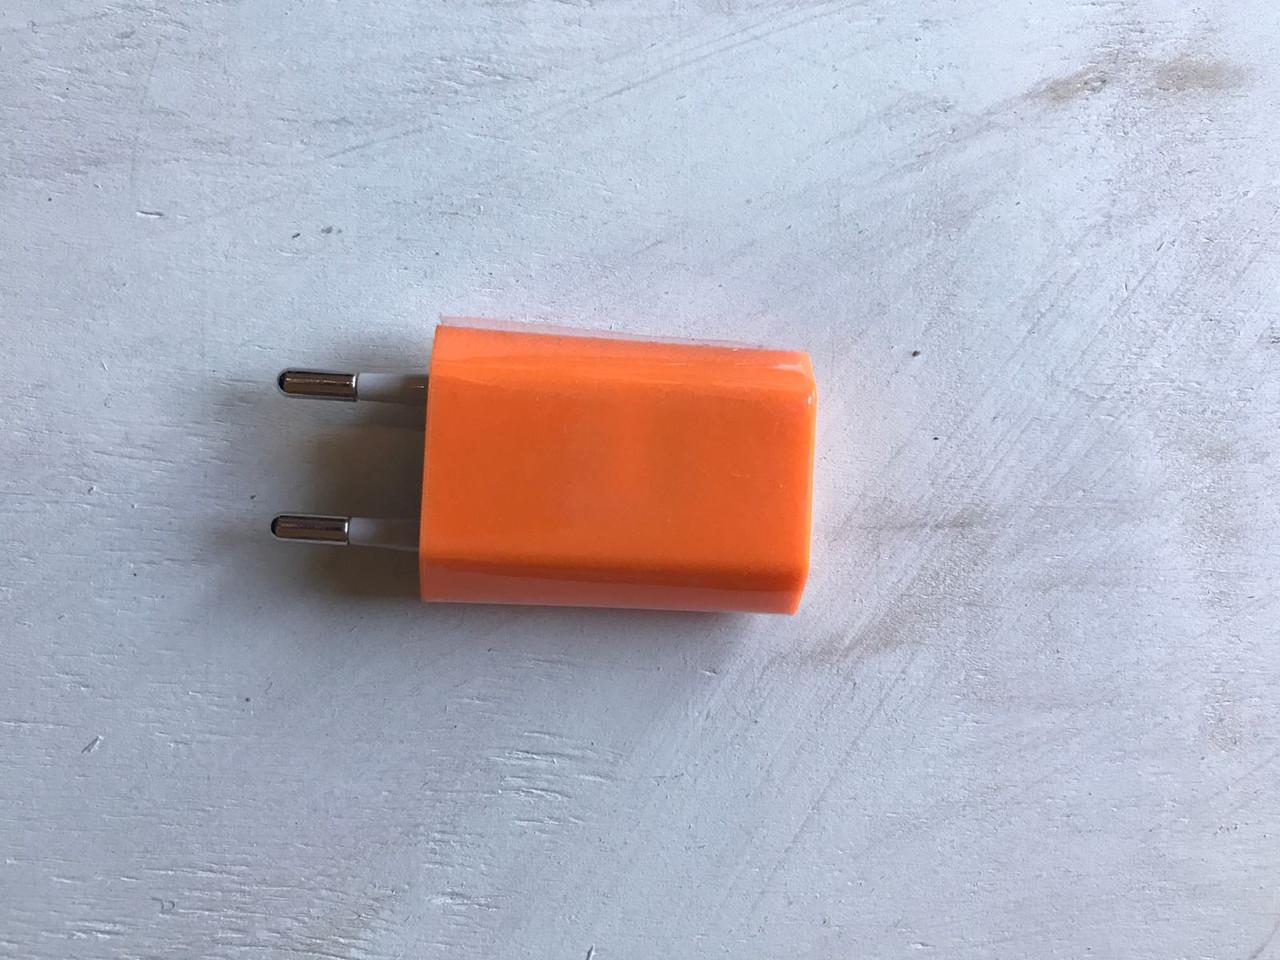 USB адаптер (переходник) для розетки 5V/1.5A оранжевого цвета